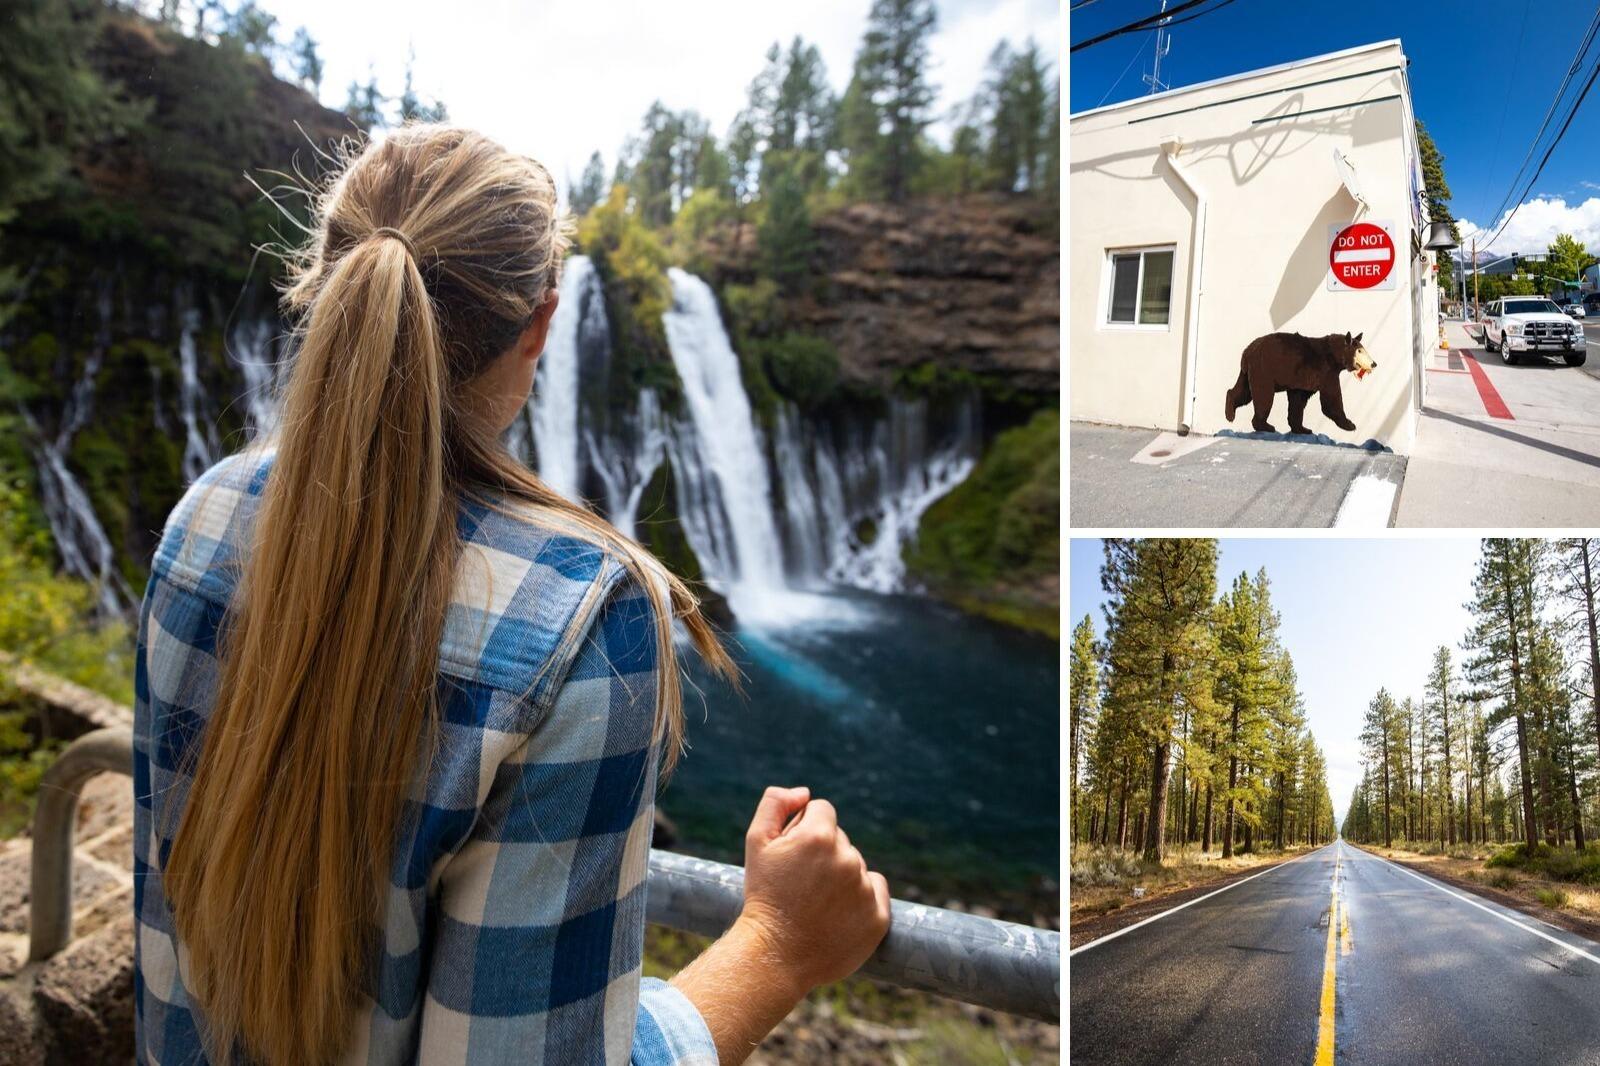 Road Trip Through UpState California